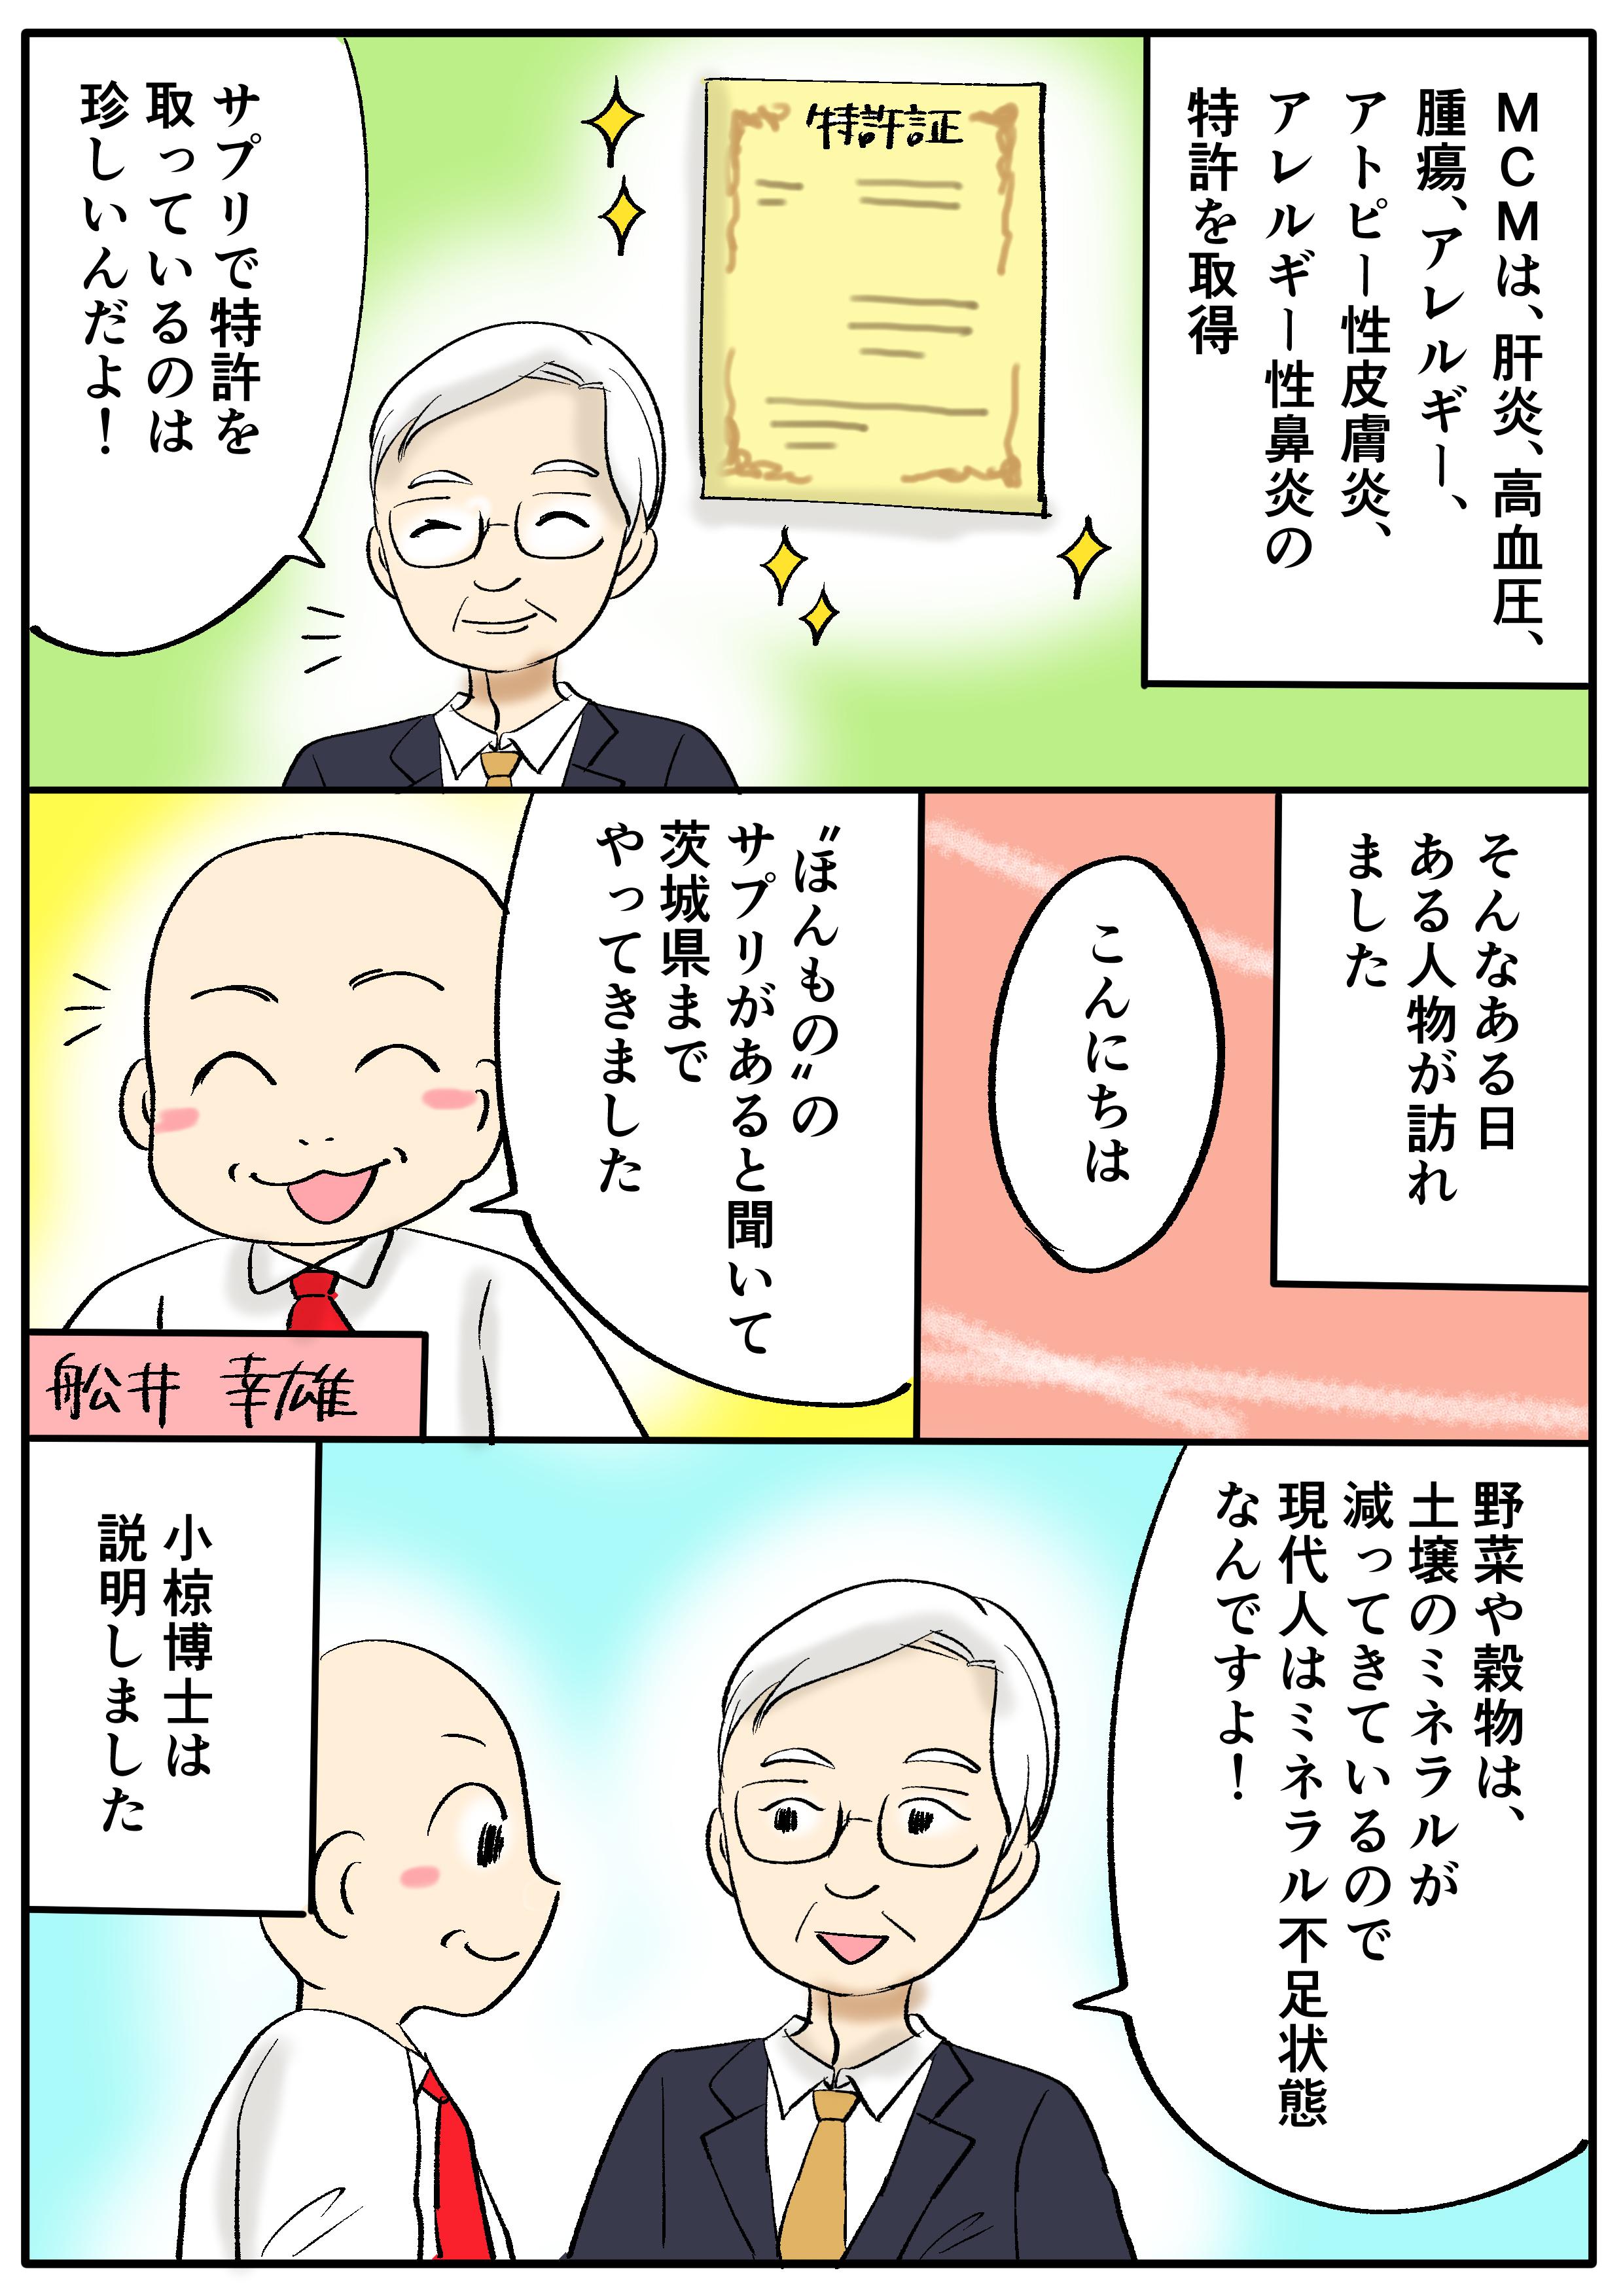 MCM漫画3